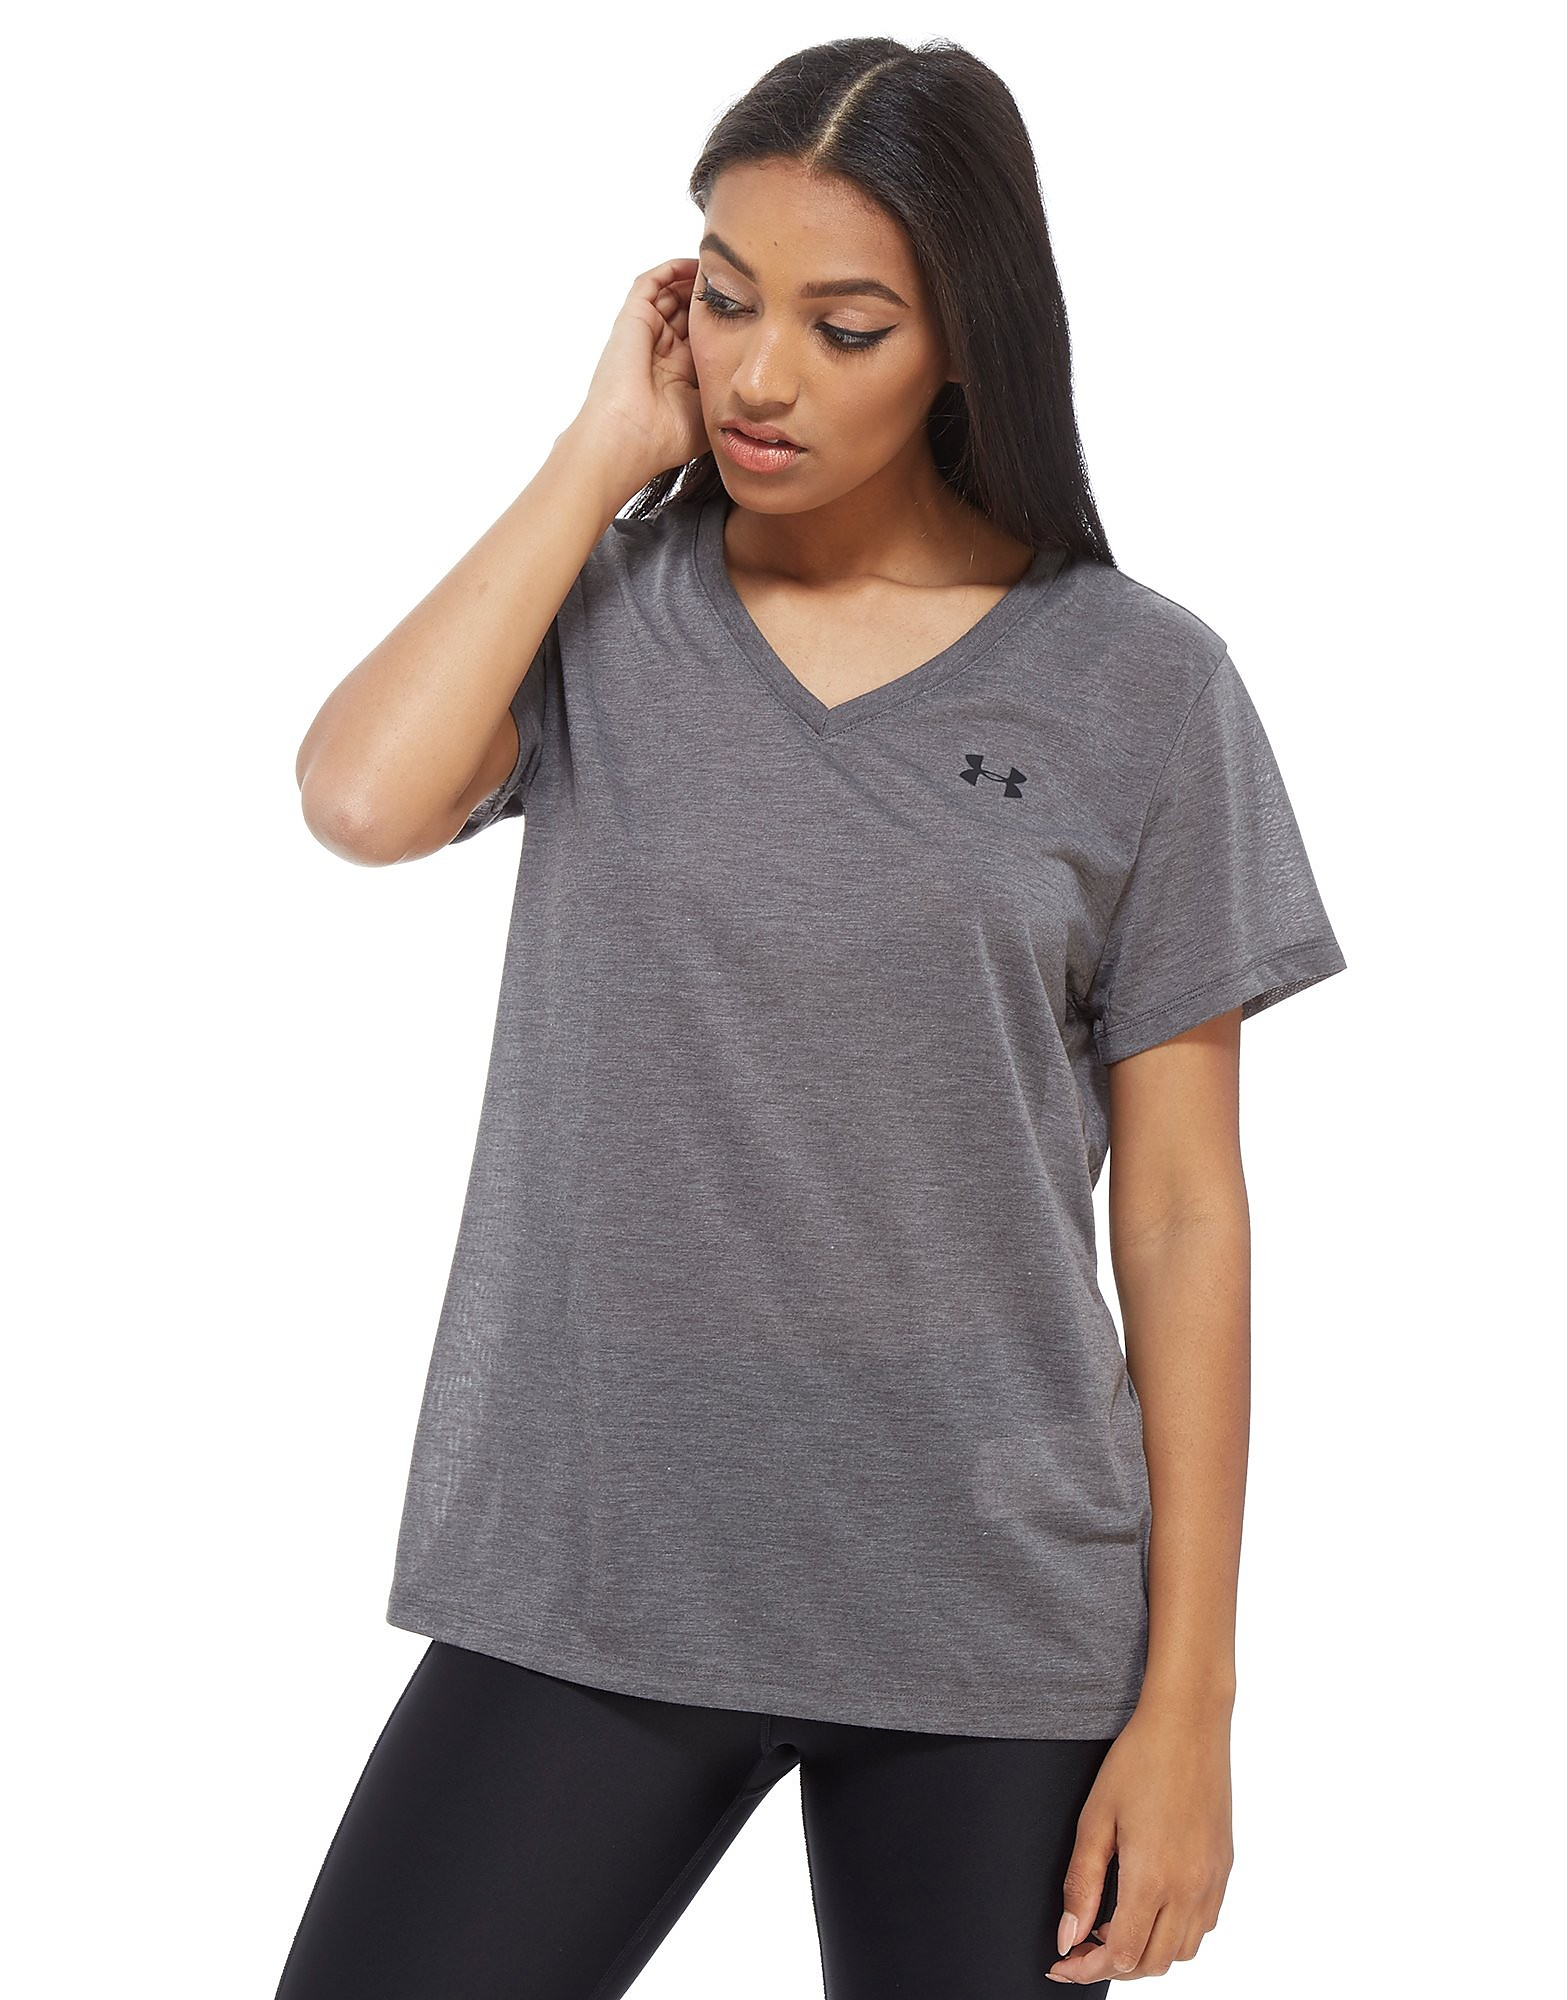 Under Armour Threadborne T-Shirt - Grijs - Dames